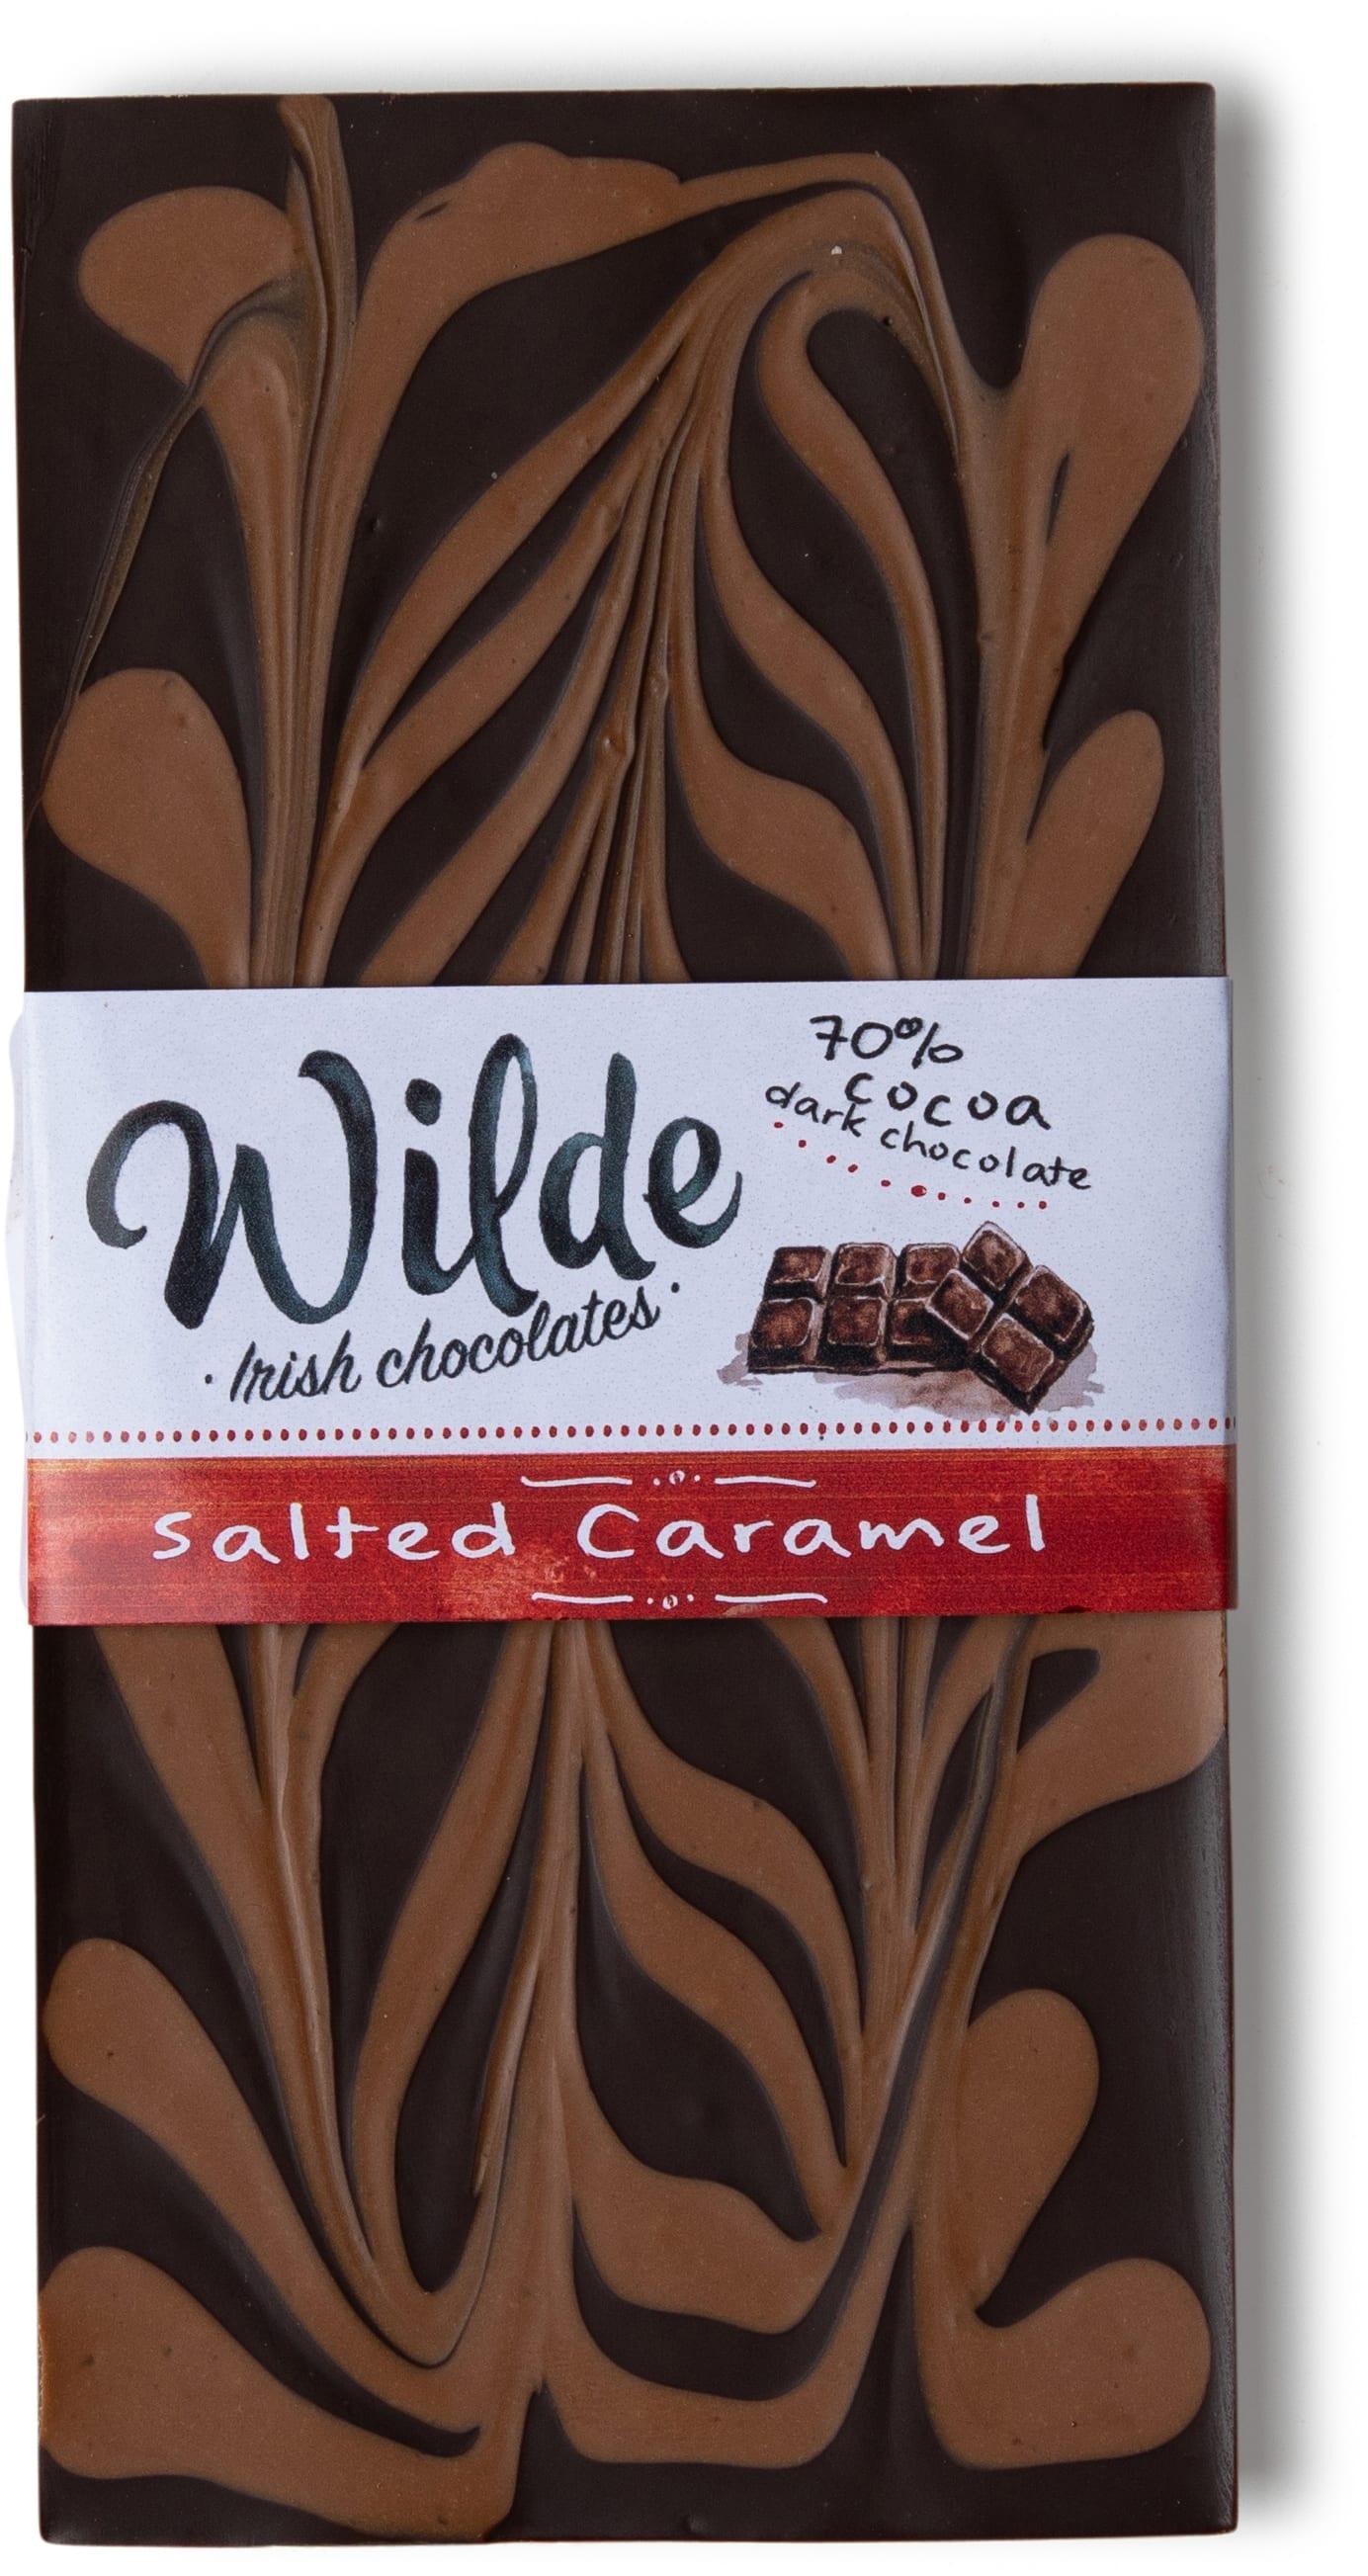 caramel chocolate bar - Wilde Irish Chocolates